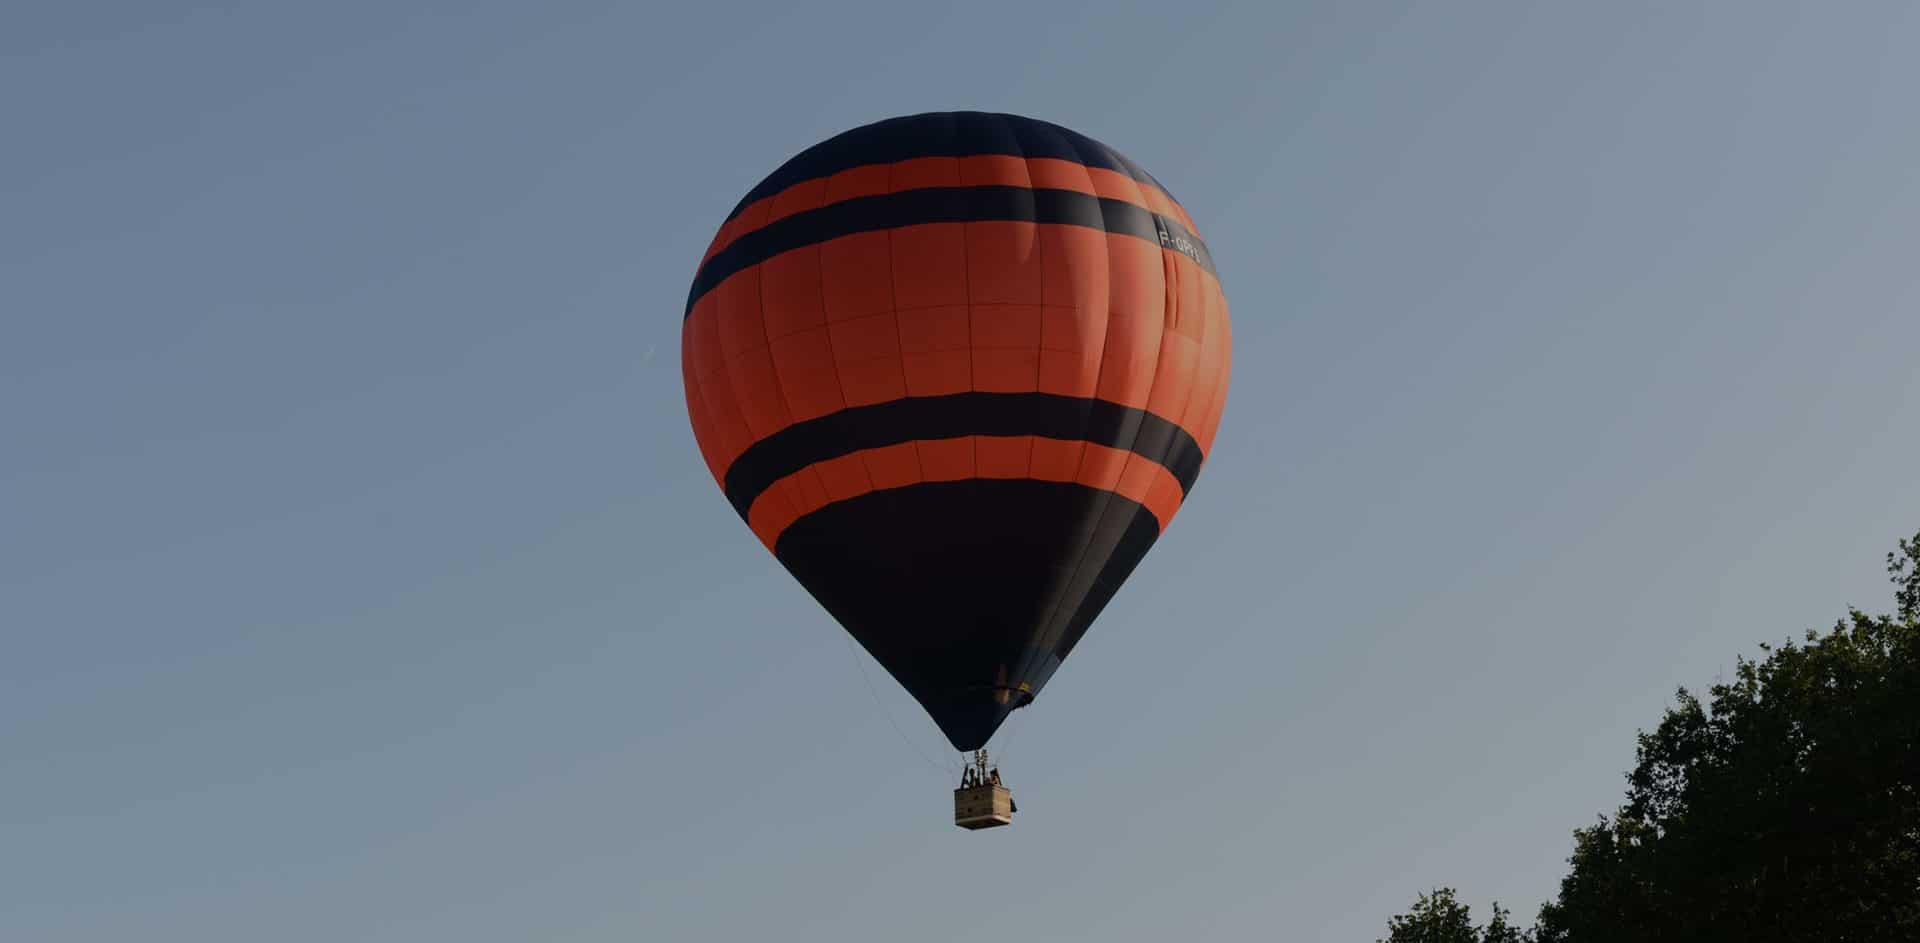 Vol en ballon - Montgolfière Perigord